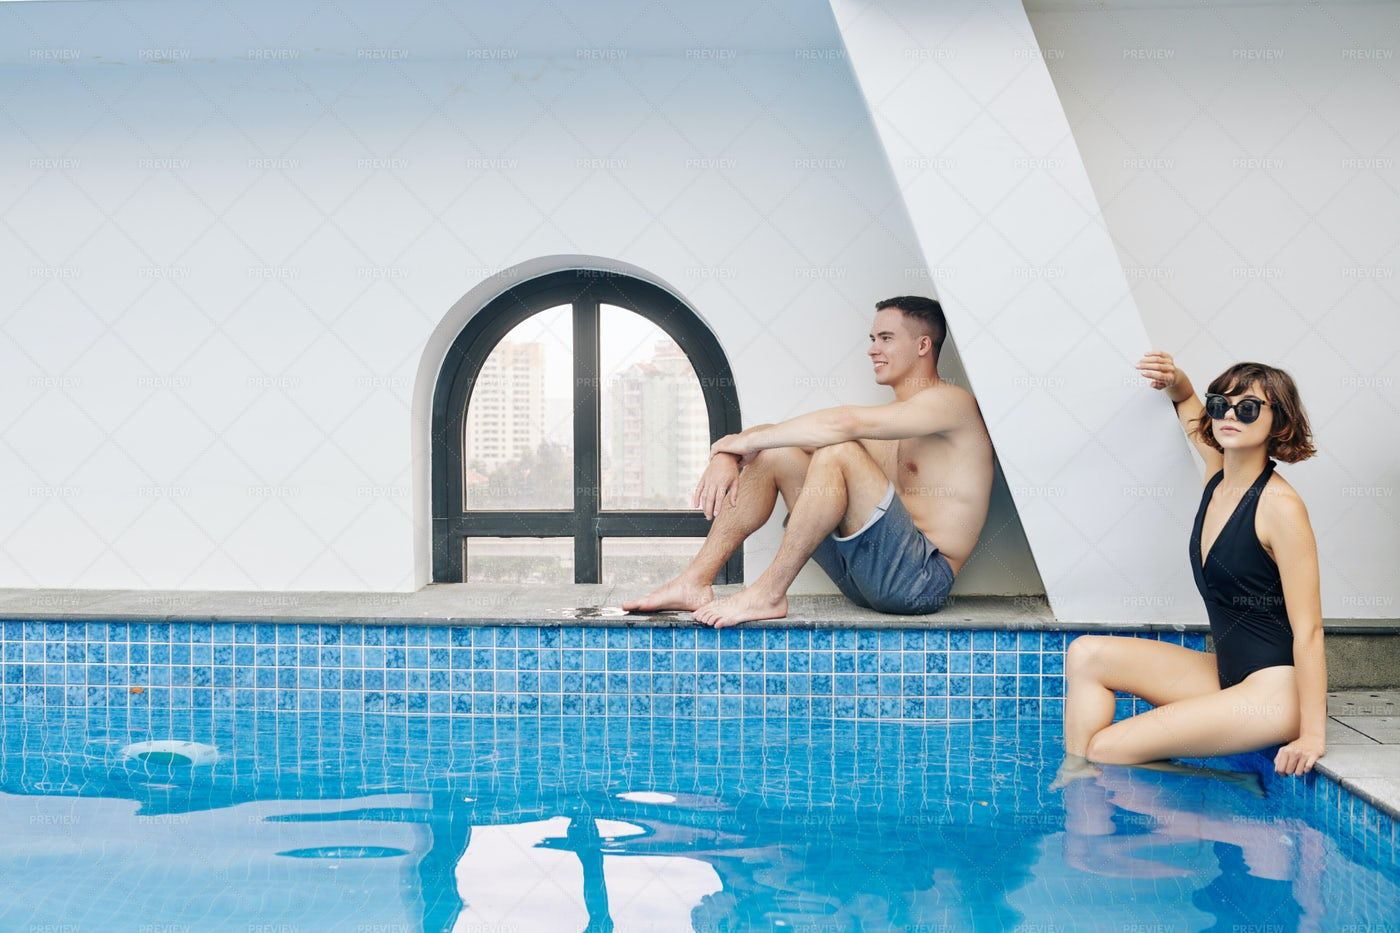 Man And Woman Sitting At Swimming Pool: Stock Photos